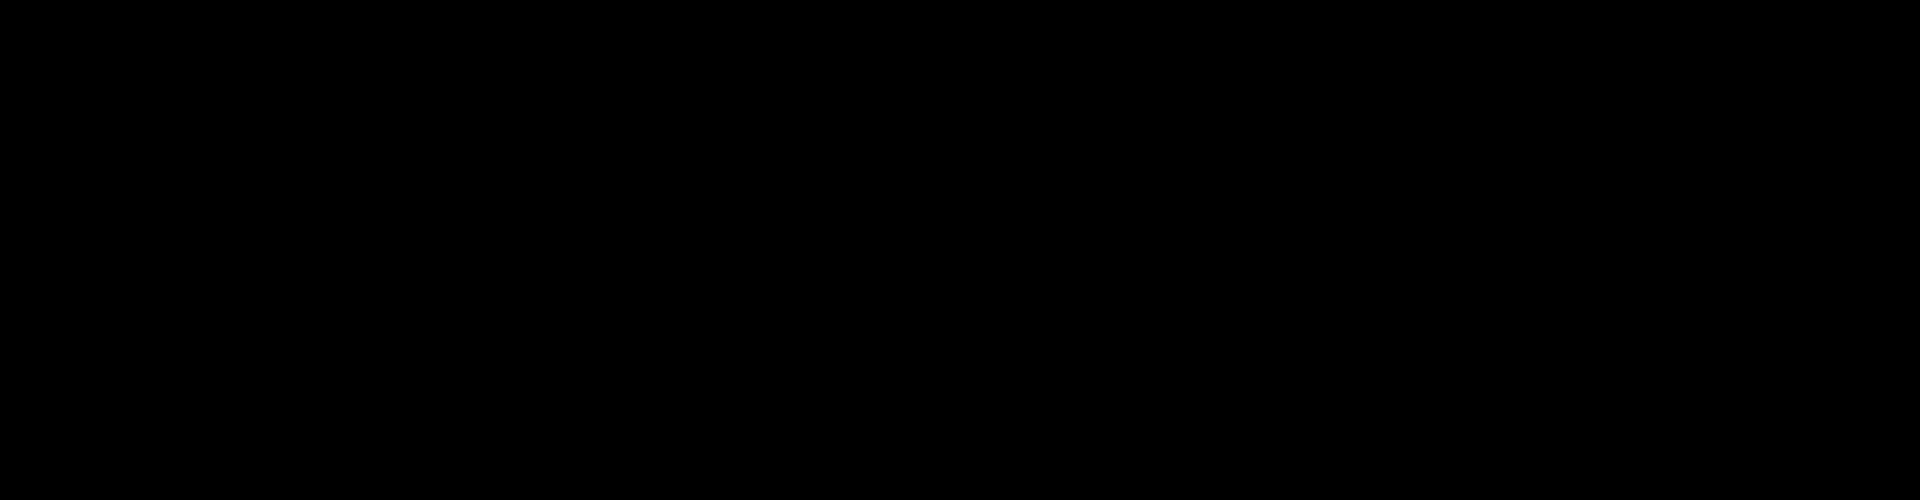 07-compass-group-logo-b_w-small